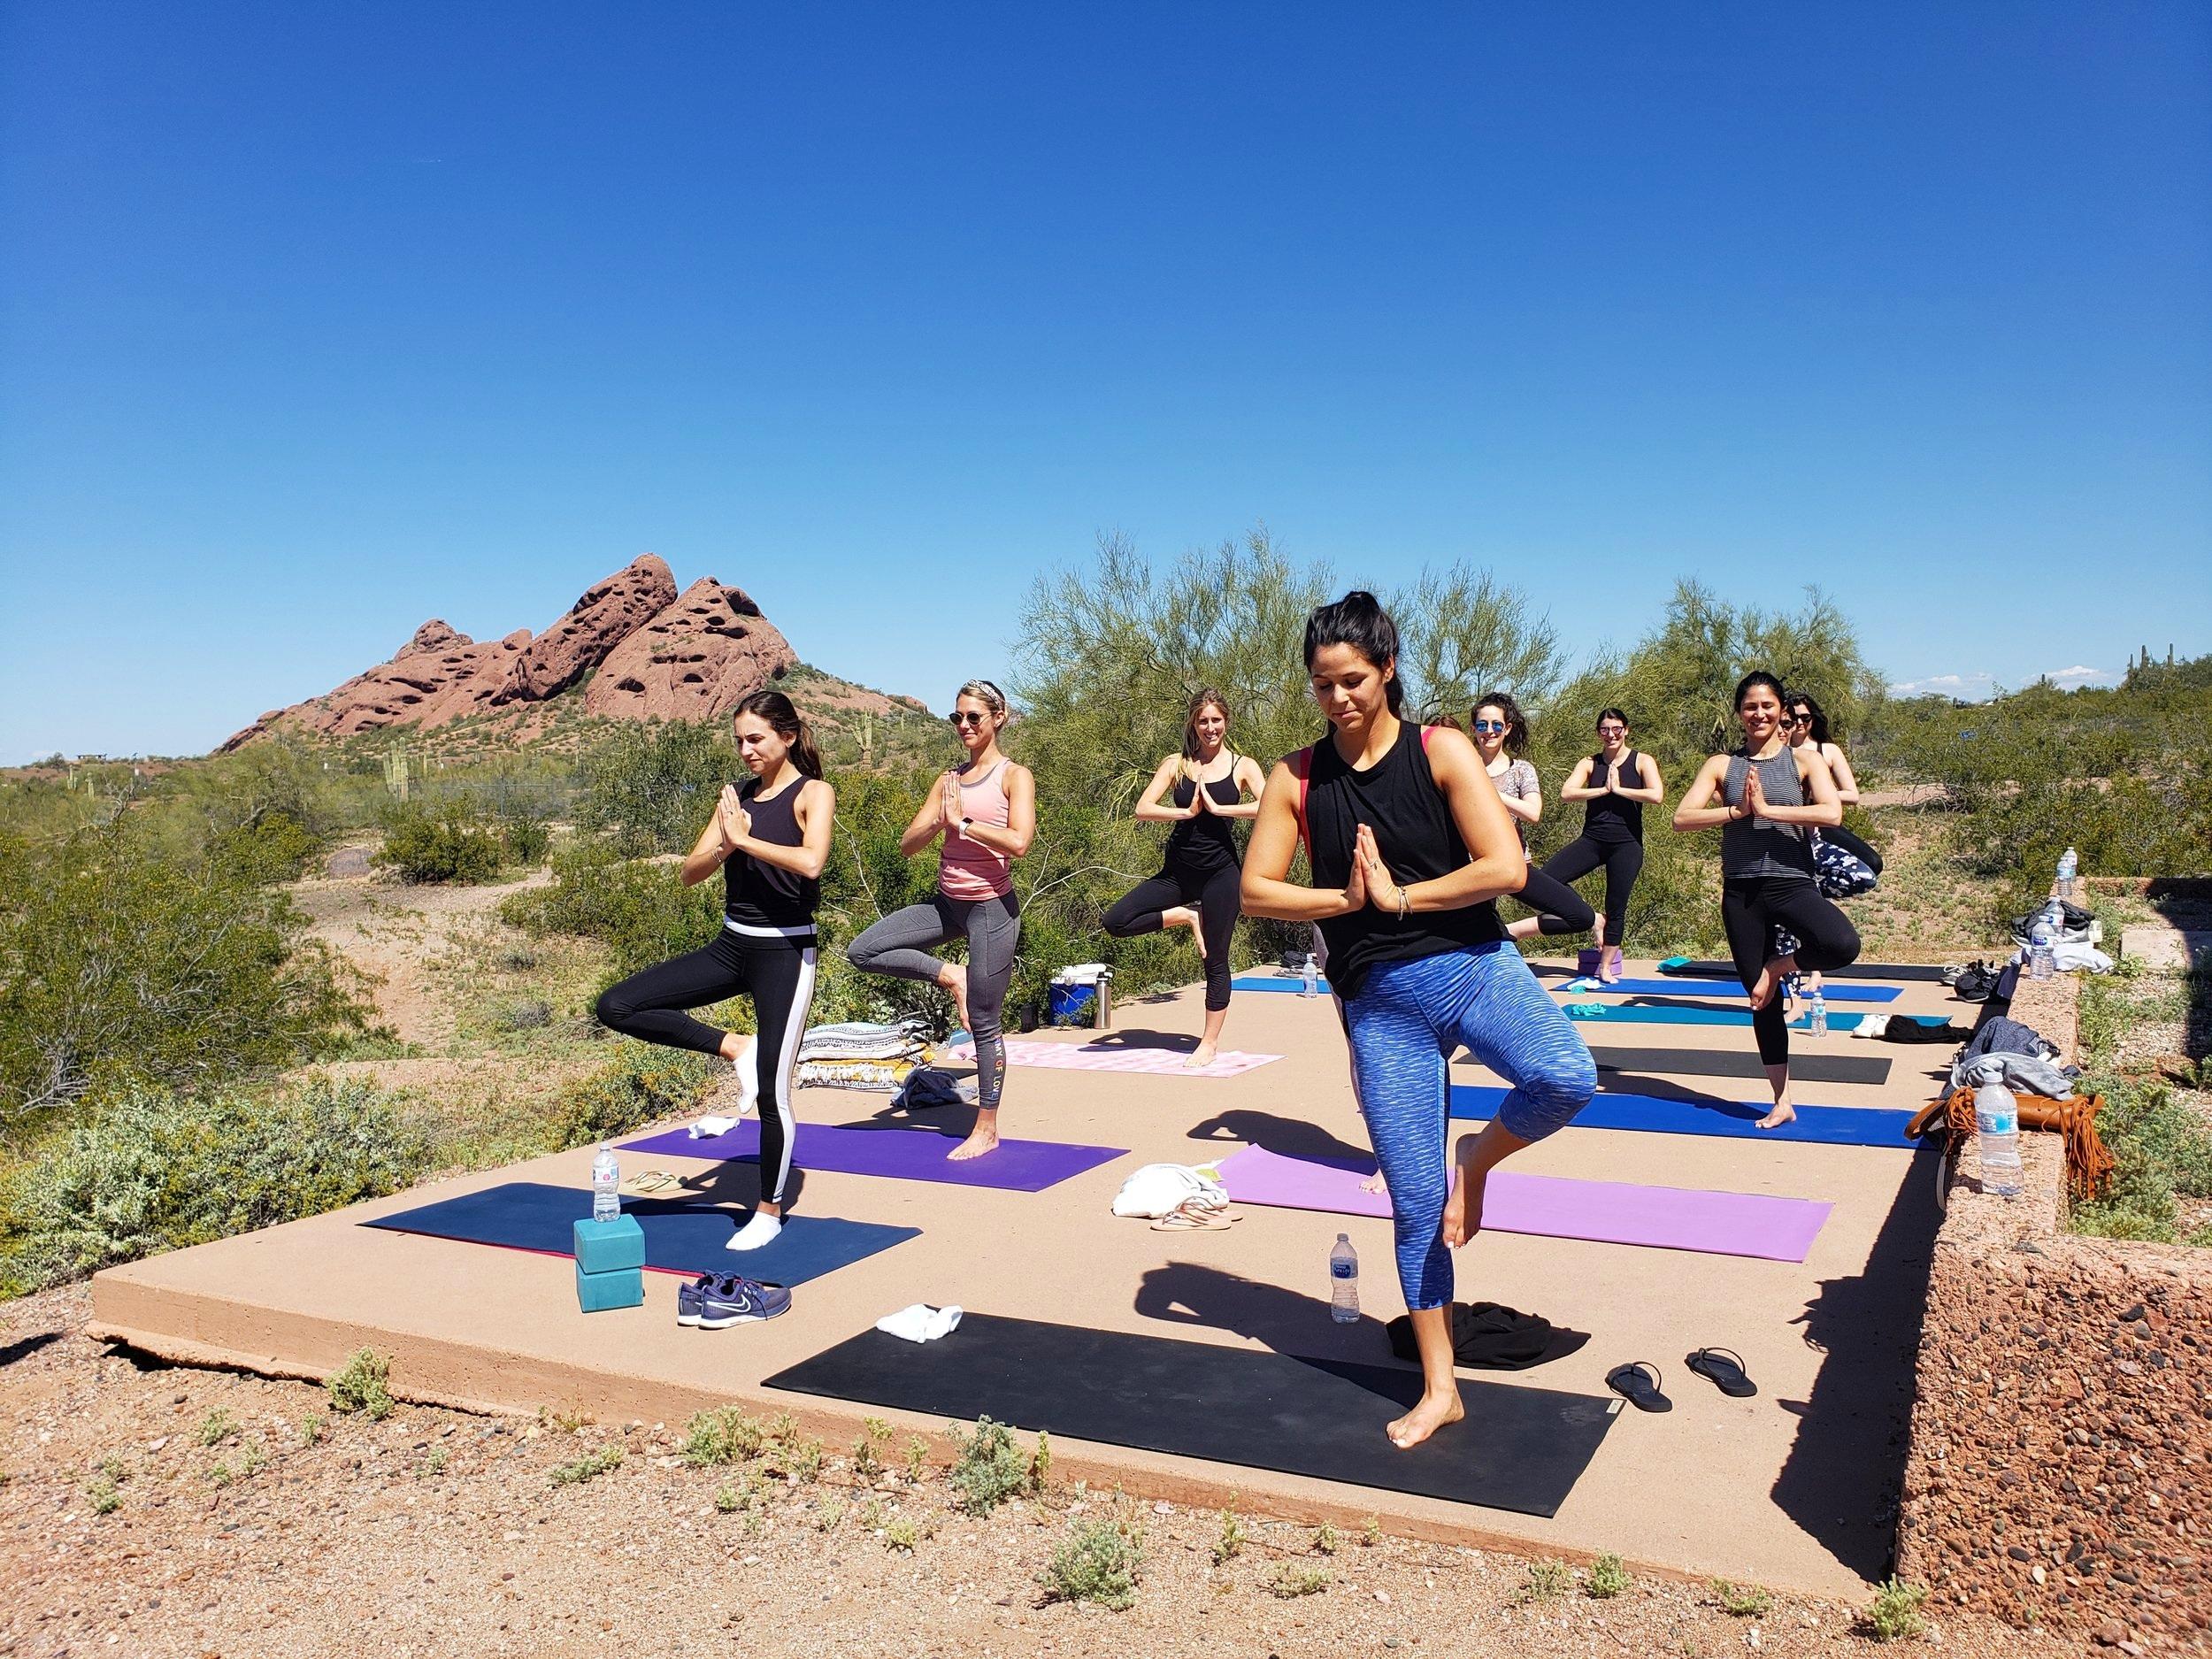 Top things to do in Phoenix, Arizona